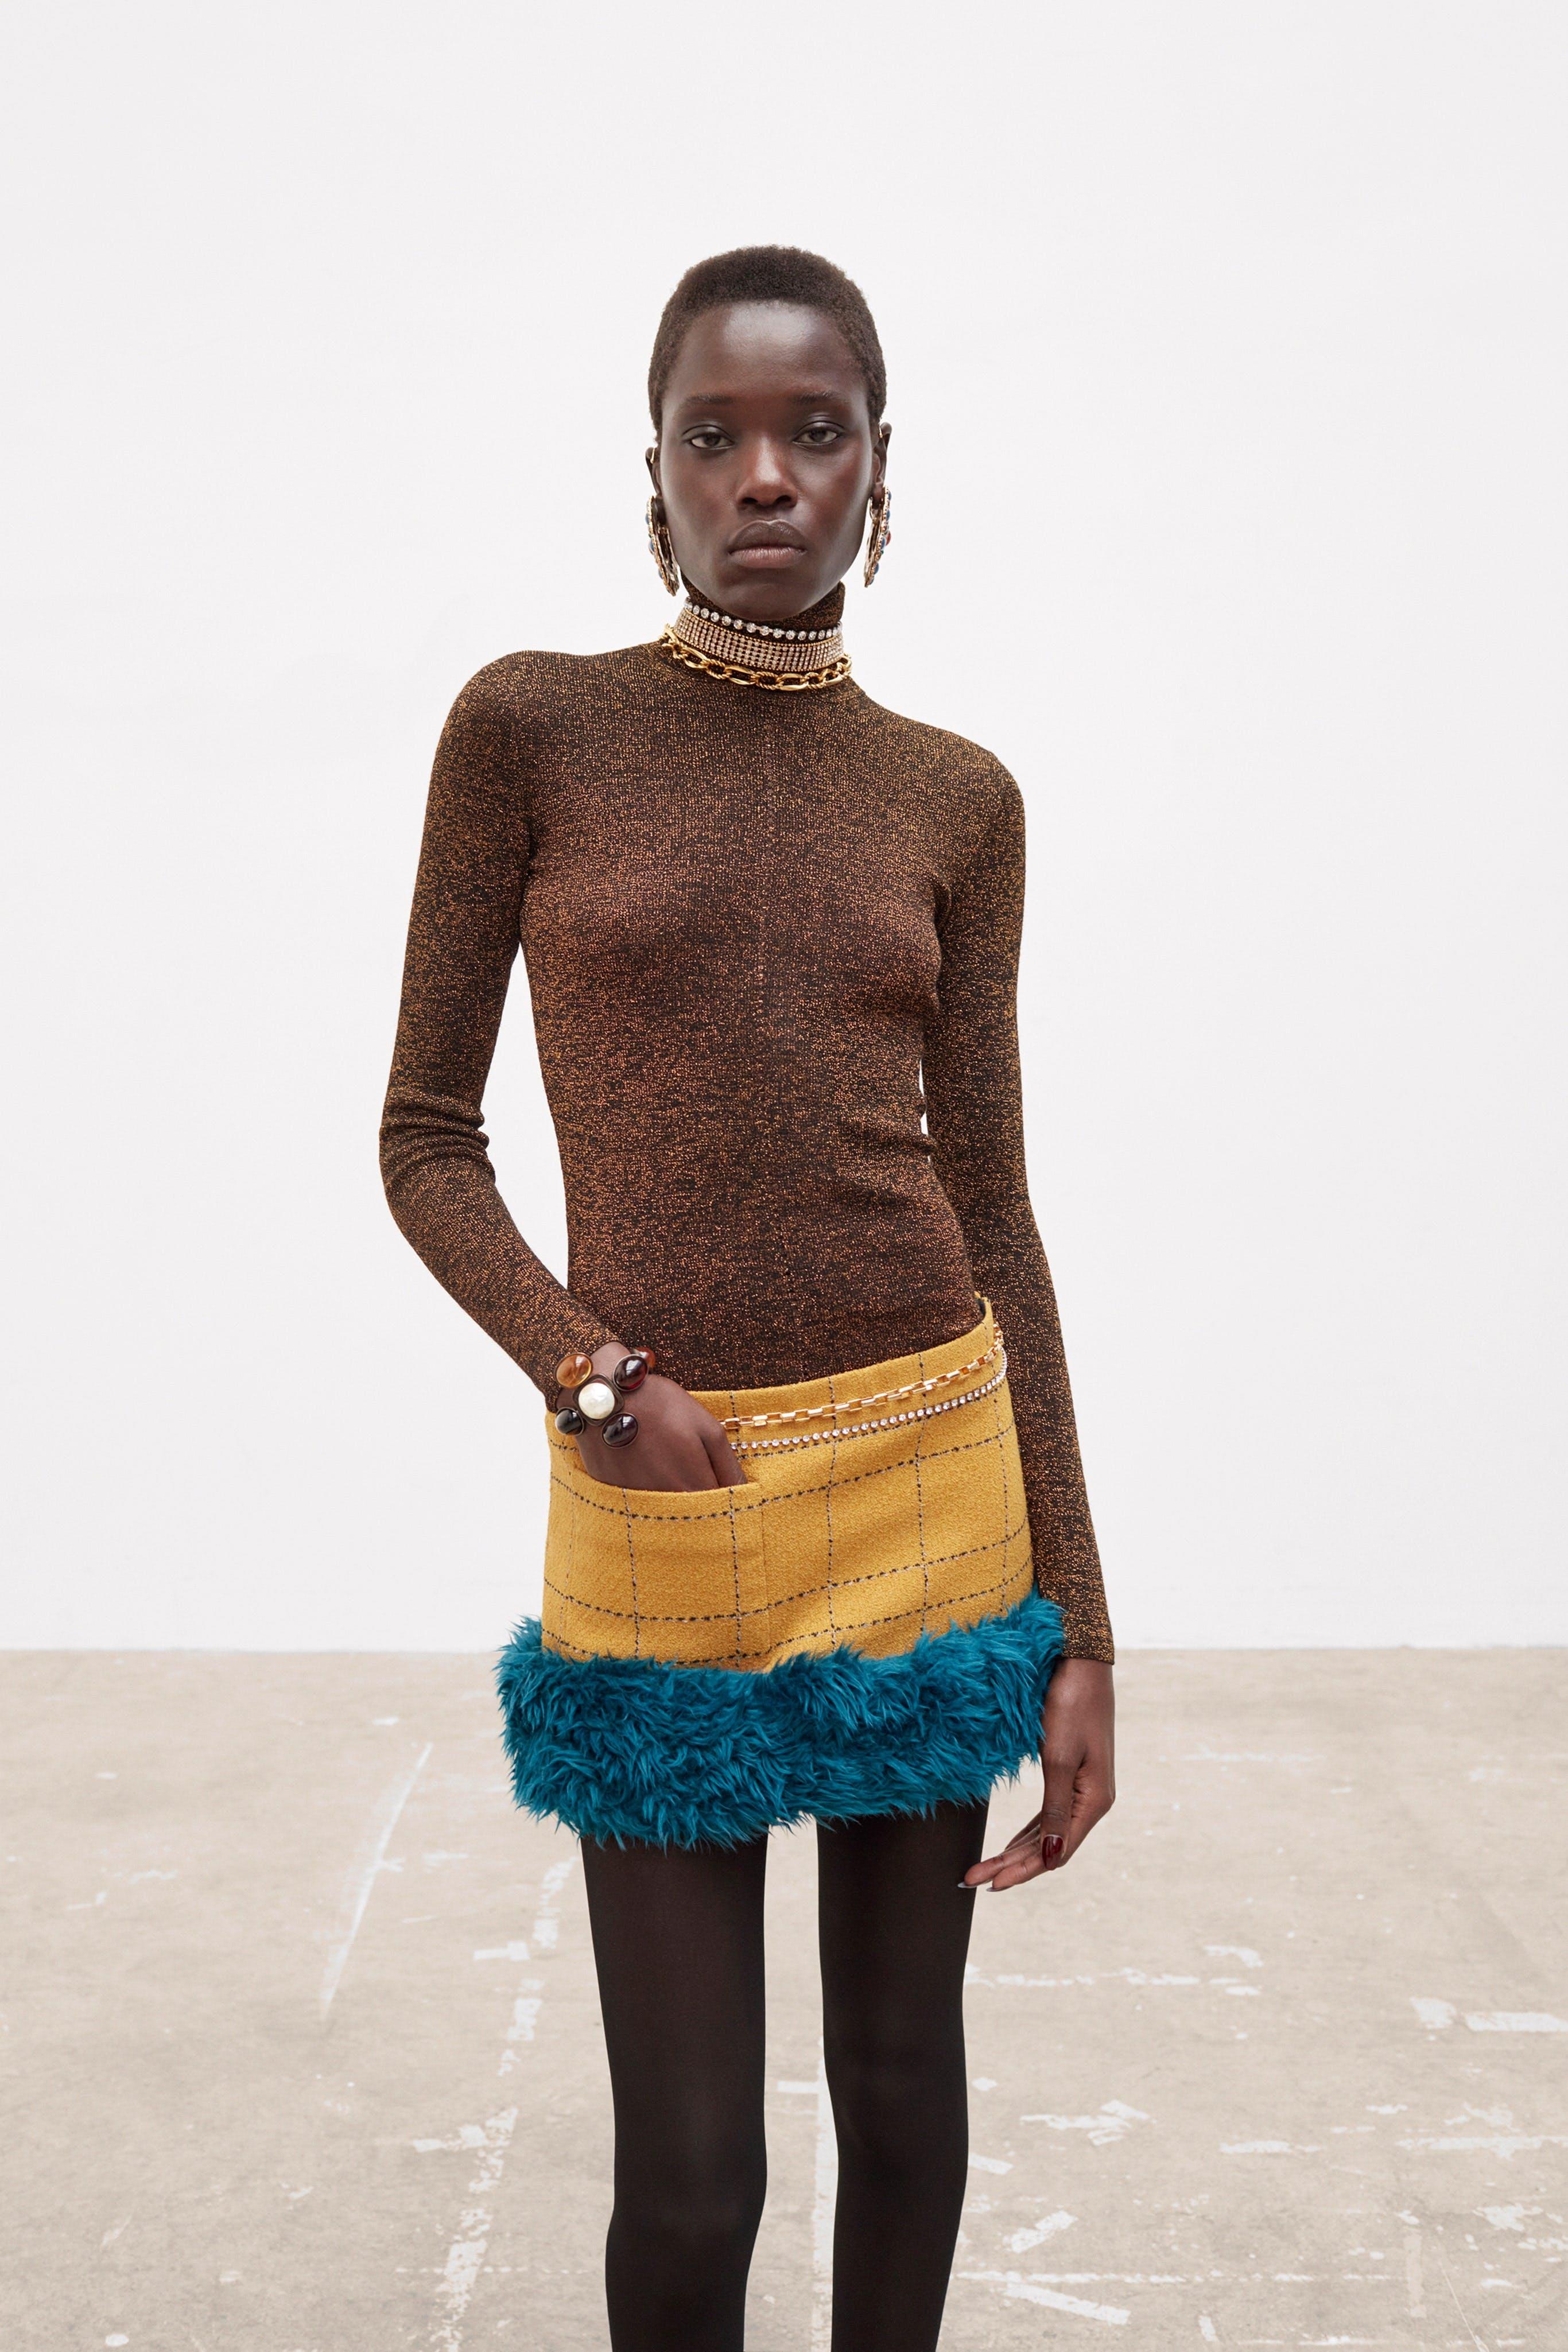 Mini skirts out of fashion The Mini Skirt Is Here To Stay Mini Skirt Trend 60s Runway Saint Laurent Miu Miu